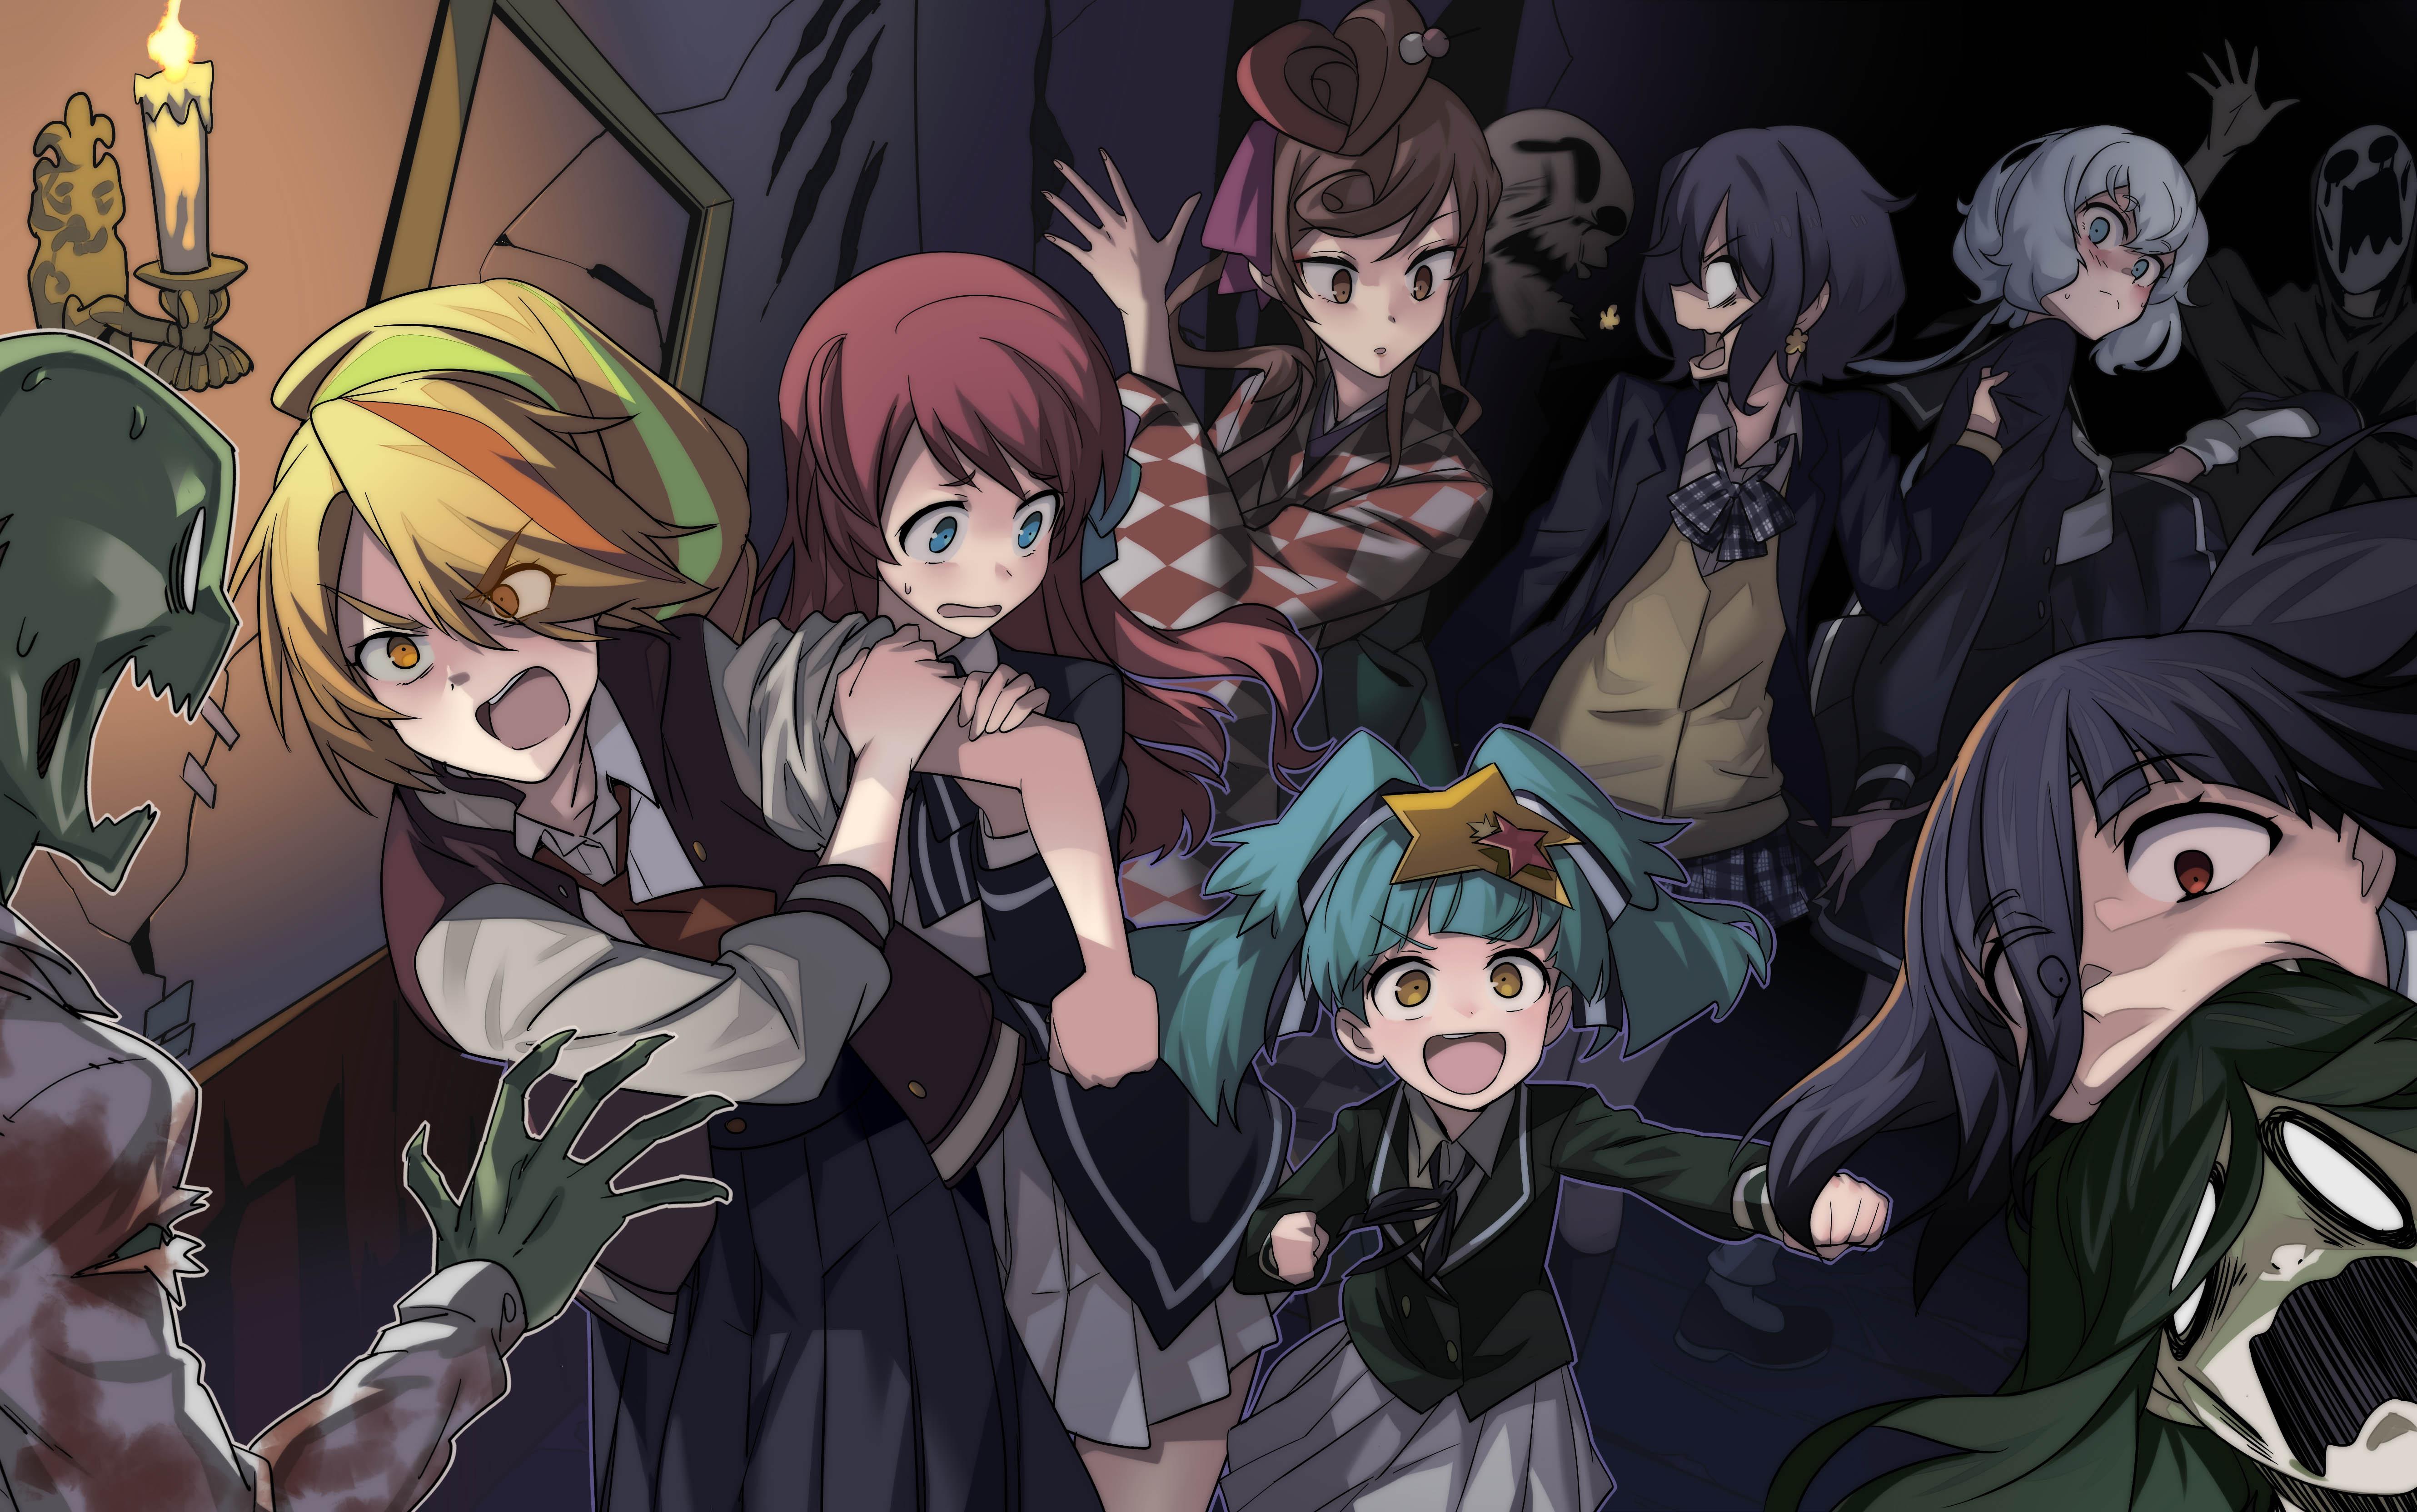 Zombieland Saga Anime Girls Zombies Zombie 2 Saki Nikaidou Zombie 4 Junko Konno Zombie 6 Lily Hoshik 5319x3328